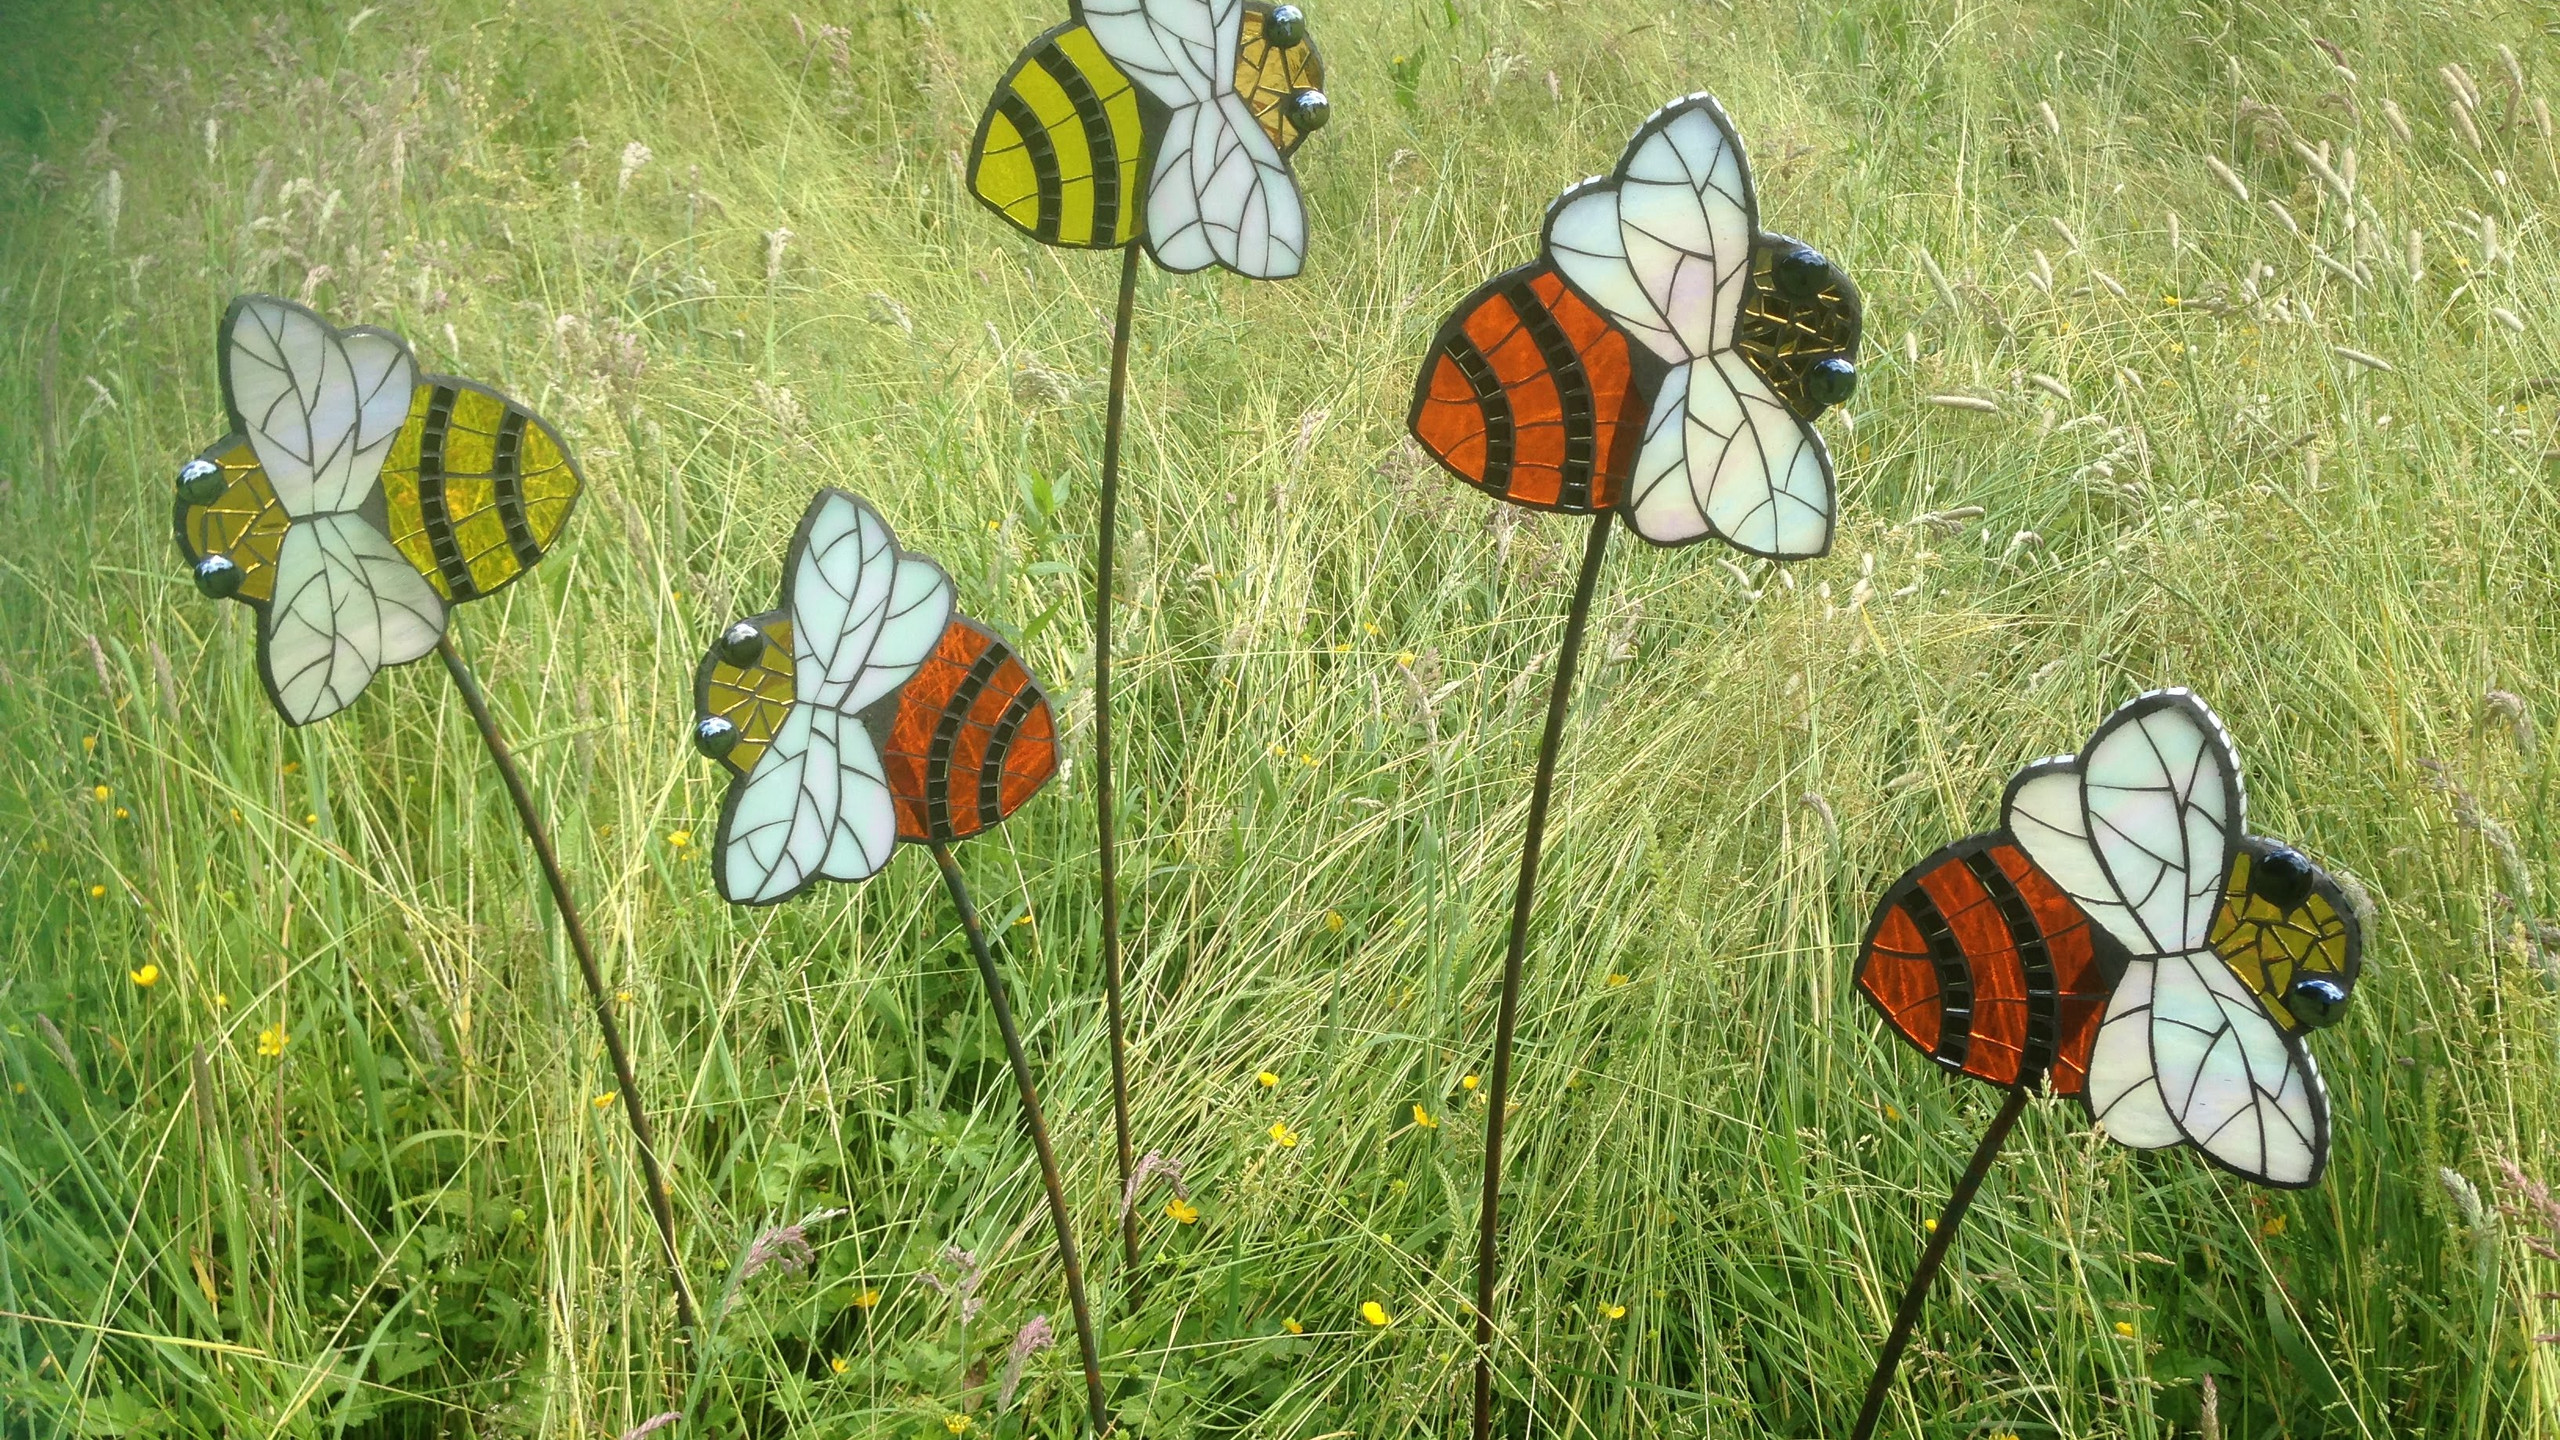 Wildlife Meadow - Bees